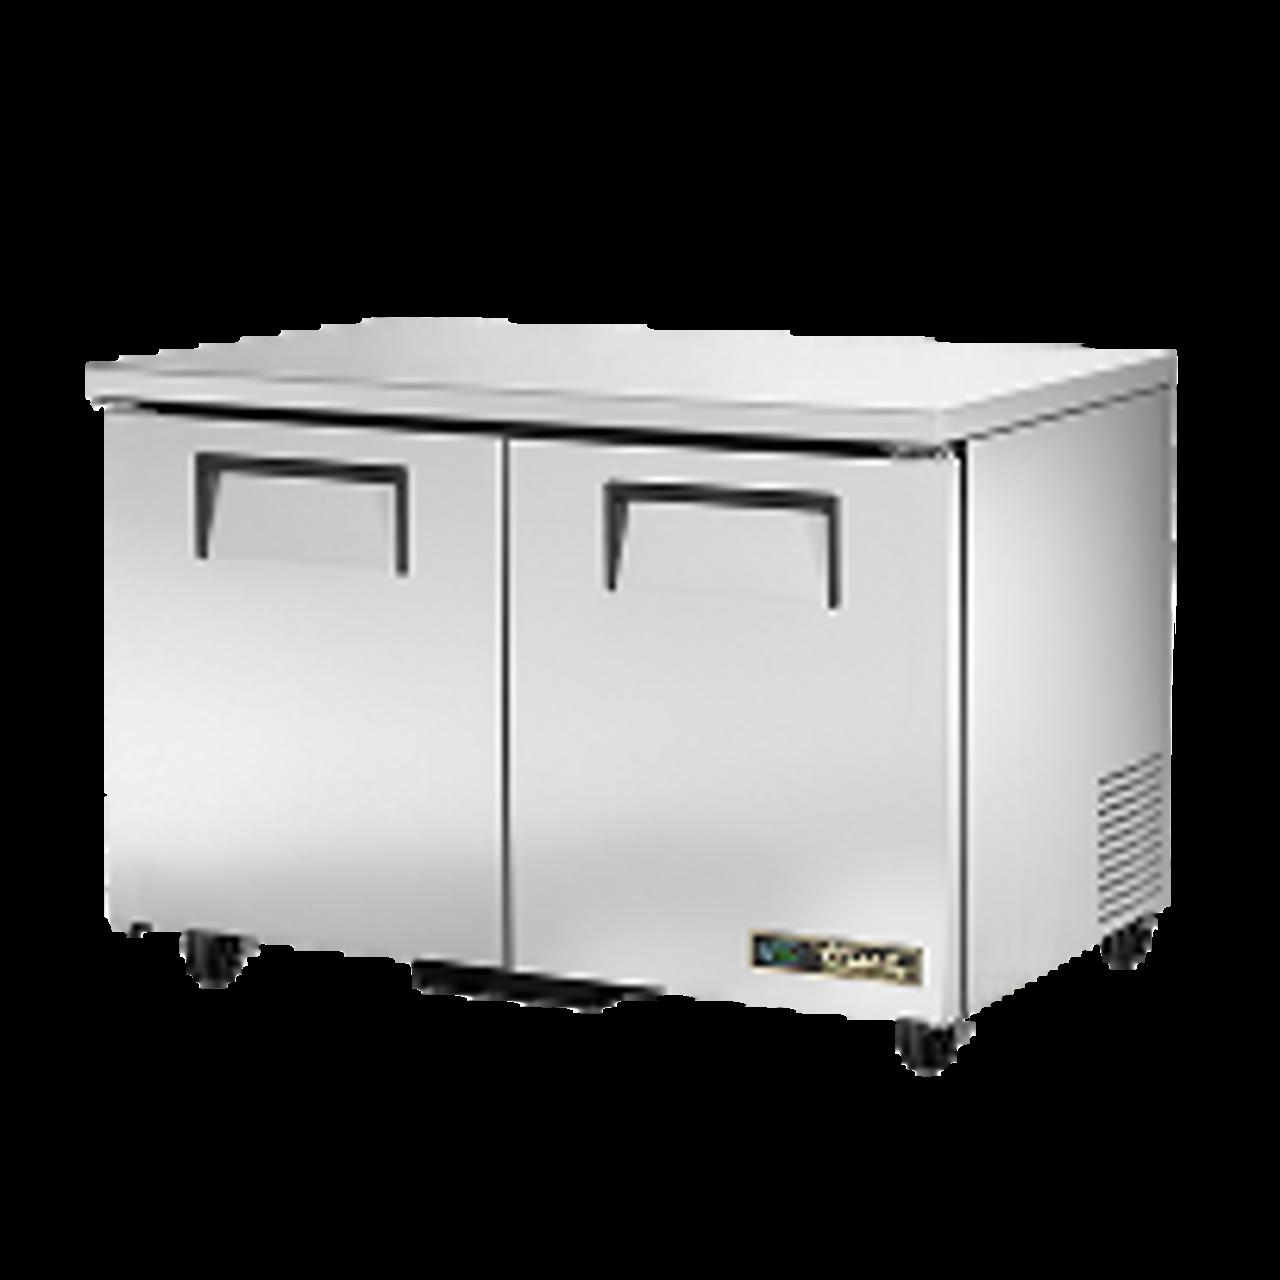 TRUETUC-48-HC 2-door Undercounter Refrigerator